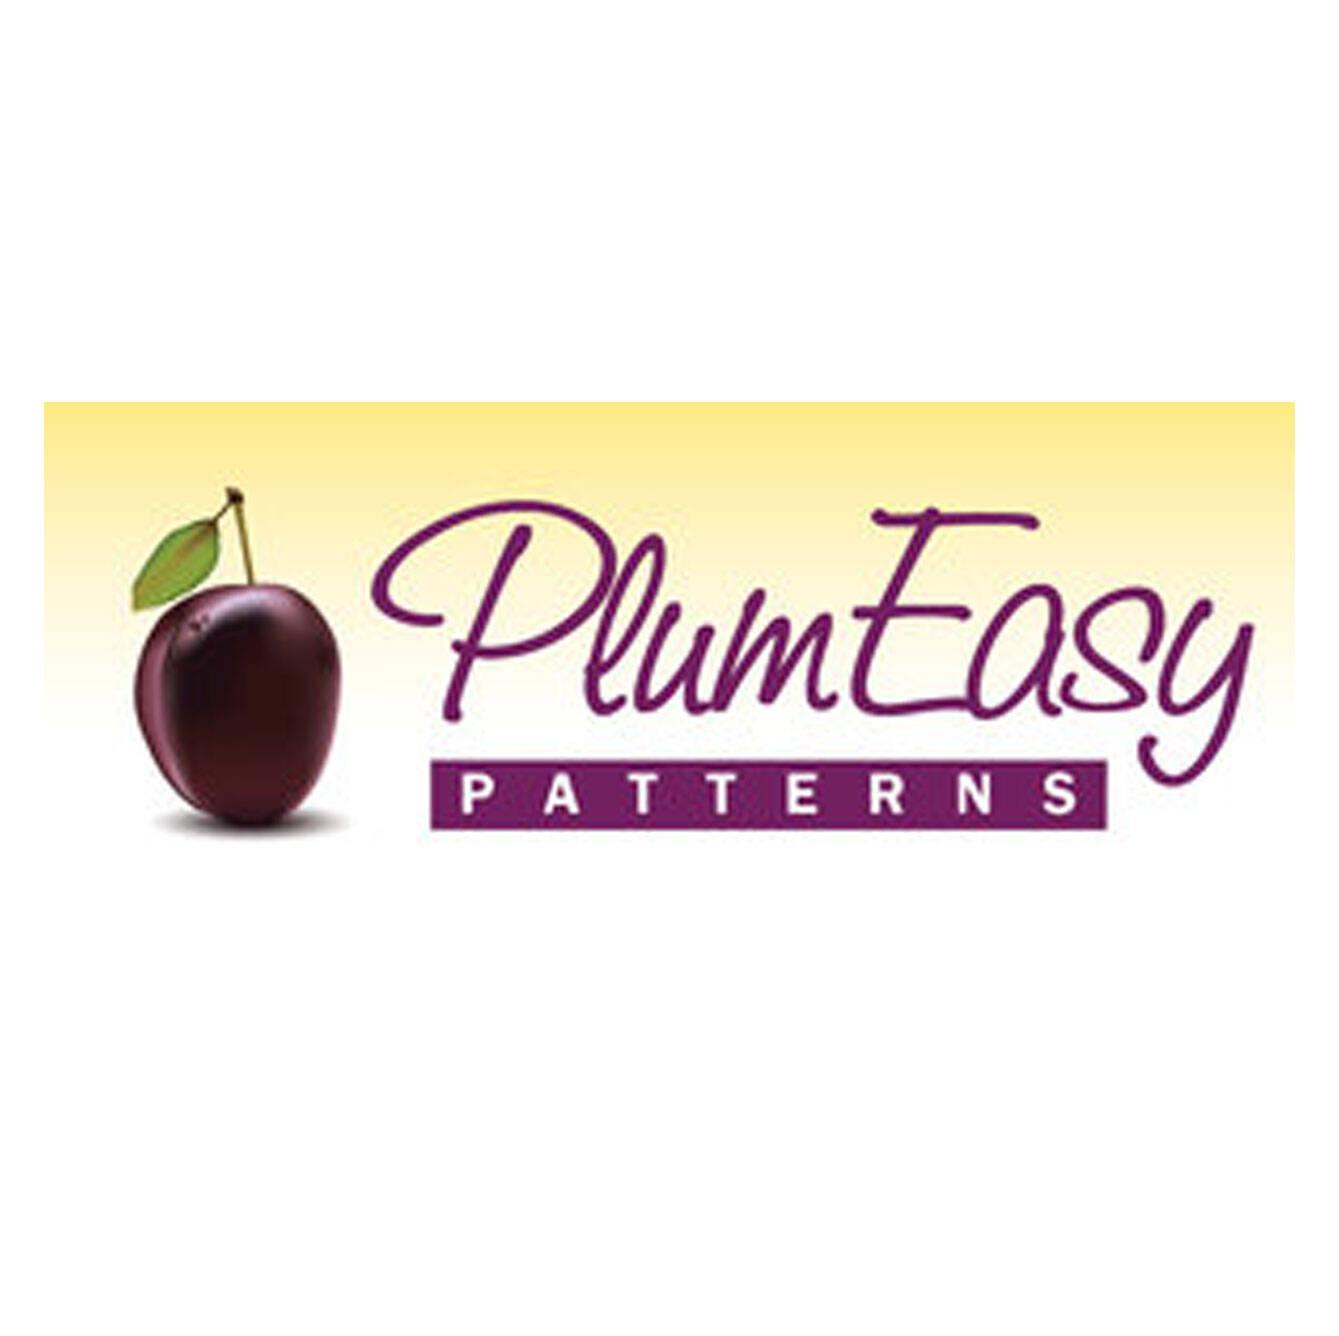 Plum Easy Patterns